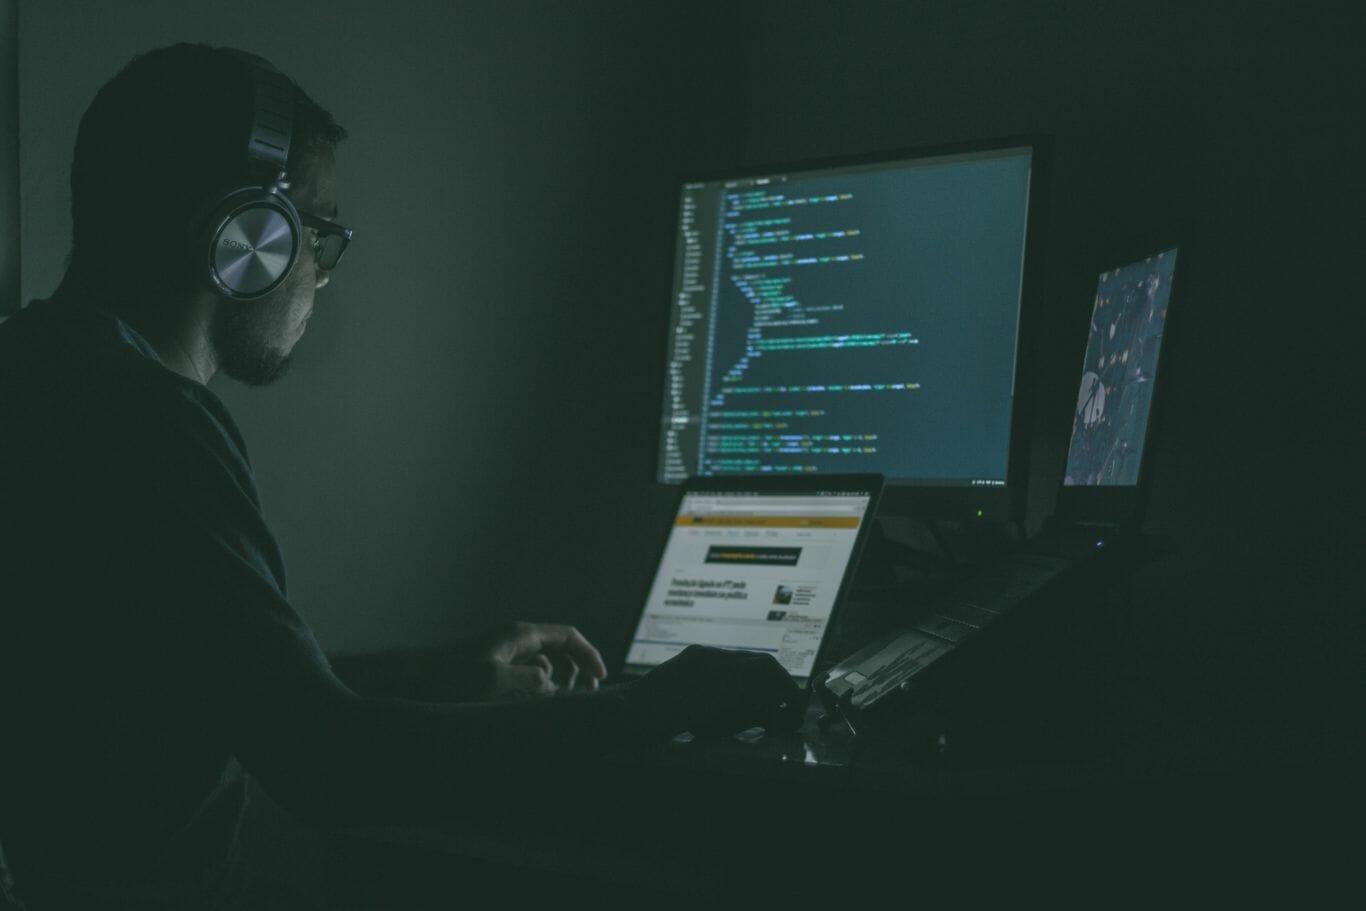 hacker eleição suiça 2